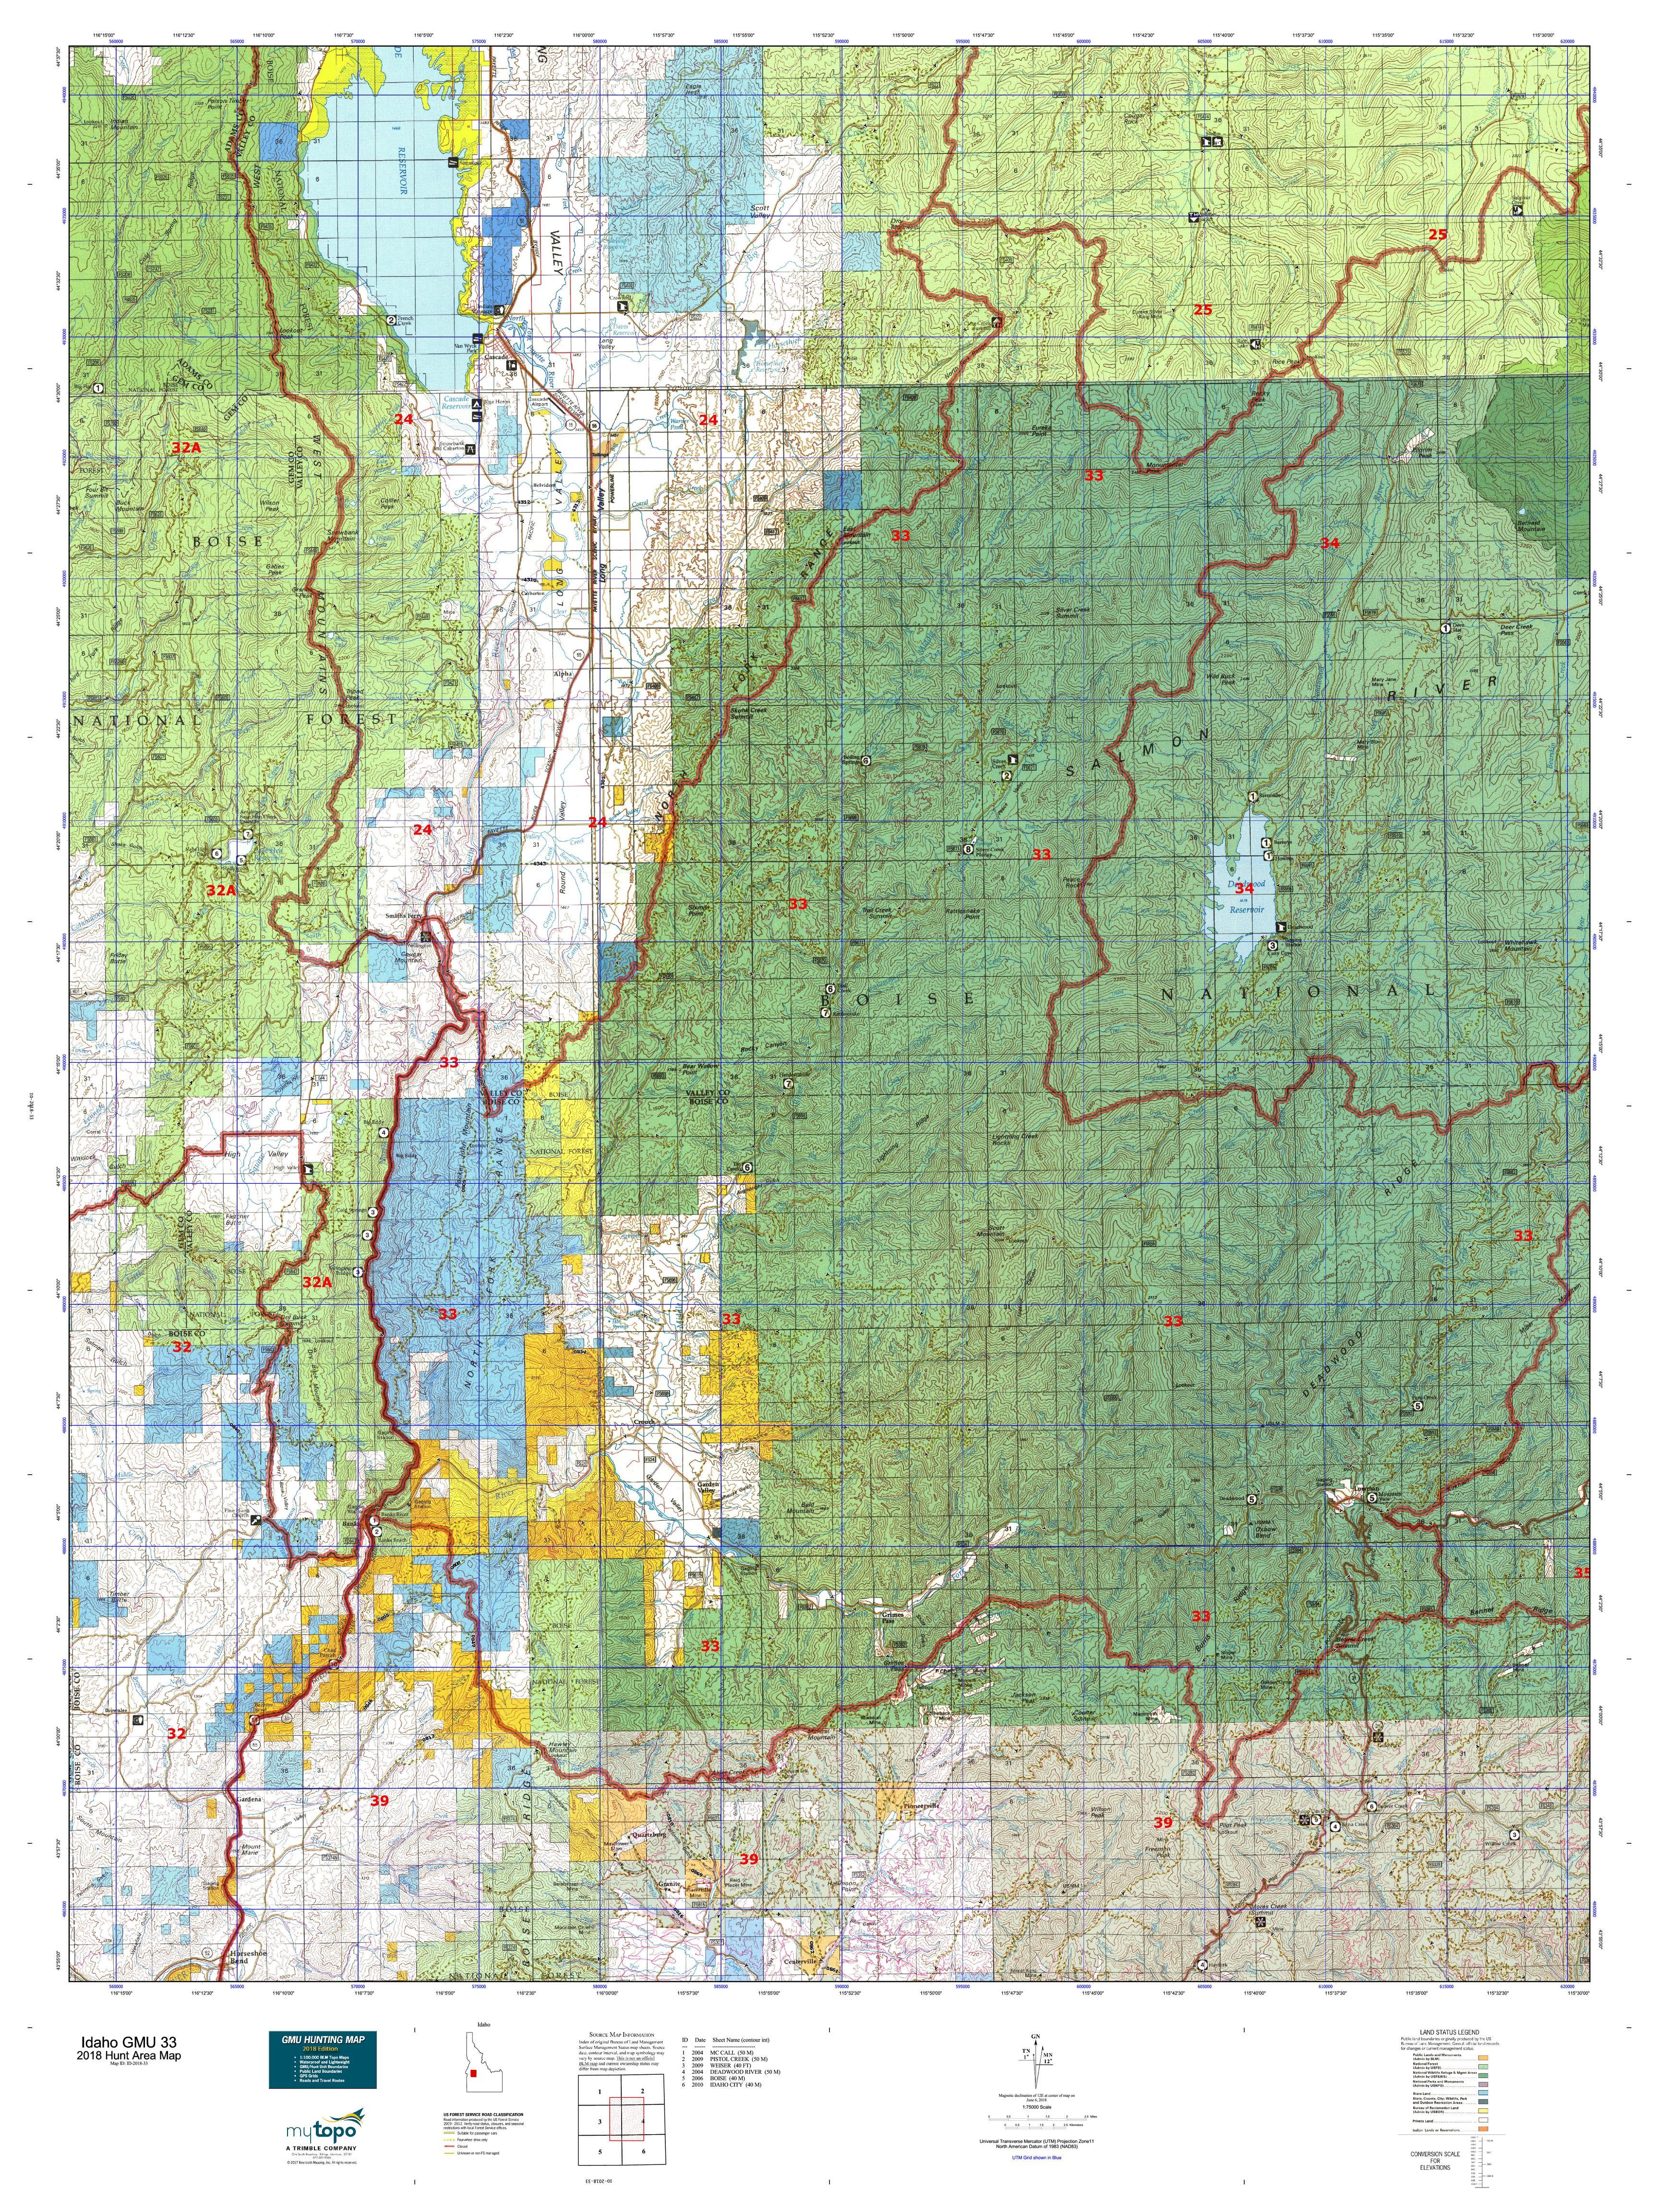 Idaho GMU 33 Map   MyTopo on kootenai county snow load map, idaho most beautiful, kootenai county zoning map, idaho land use map, idaho sand dunes map, idaho unit 28 elk population, u.s. federal land map, idaho county map, boulder city idaho map, idaho hunting map, idaho natural resources map, idaho rivers, idaho department of lands map, new mexico blm land map, idaho nrcs mlra map, idaho location on map, idaho big game unit map, idaho blm maps,